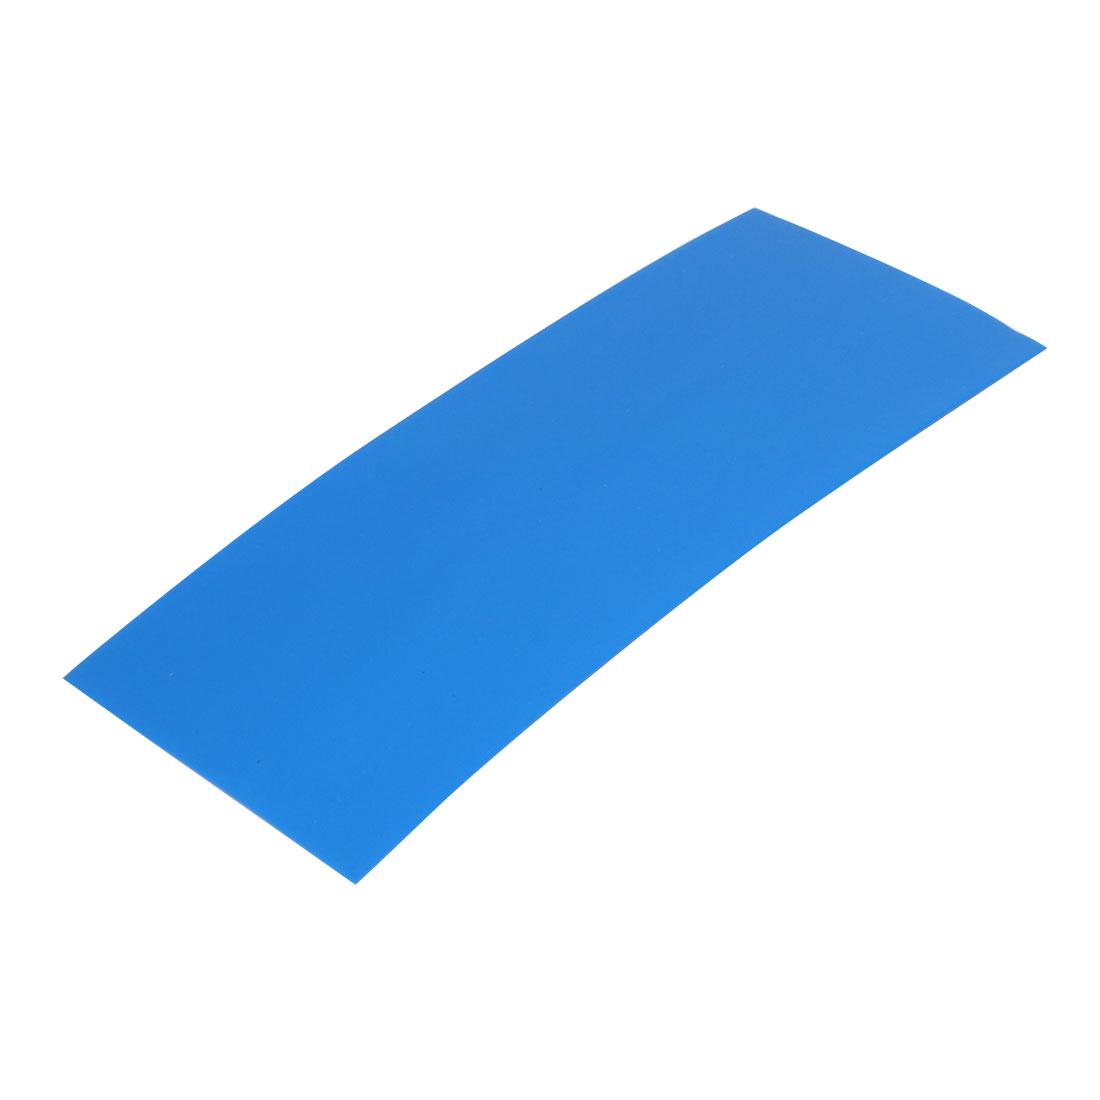 29.5mm Flat Width 72mm Long PVC Heat Shrinkable Tube Blue for 18650 Battery